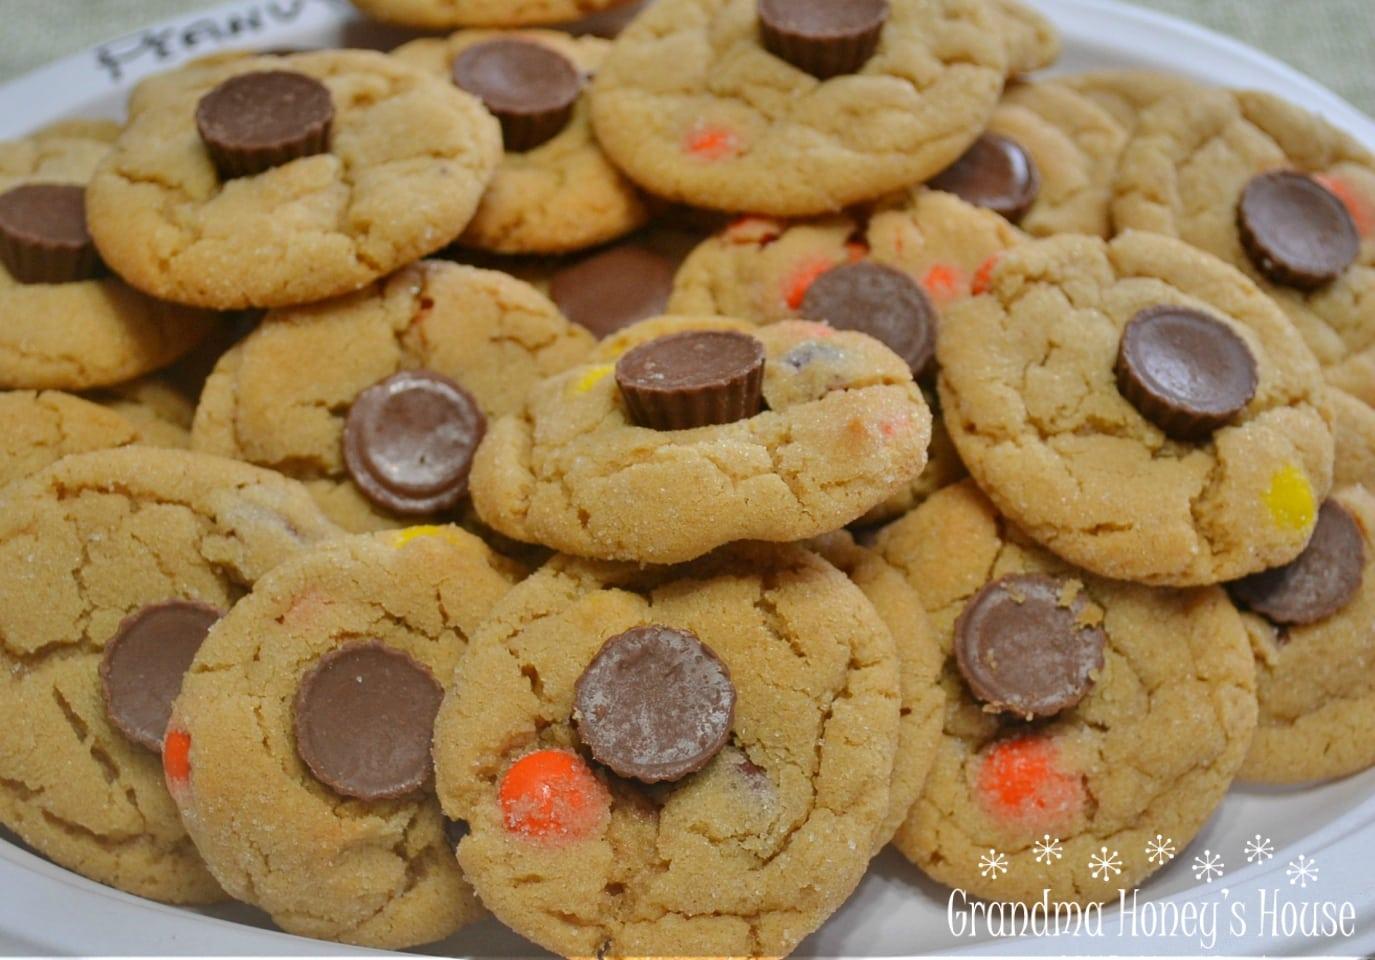 Triple Peanut Butter Cookie Delights